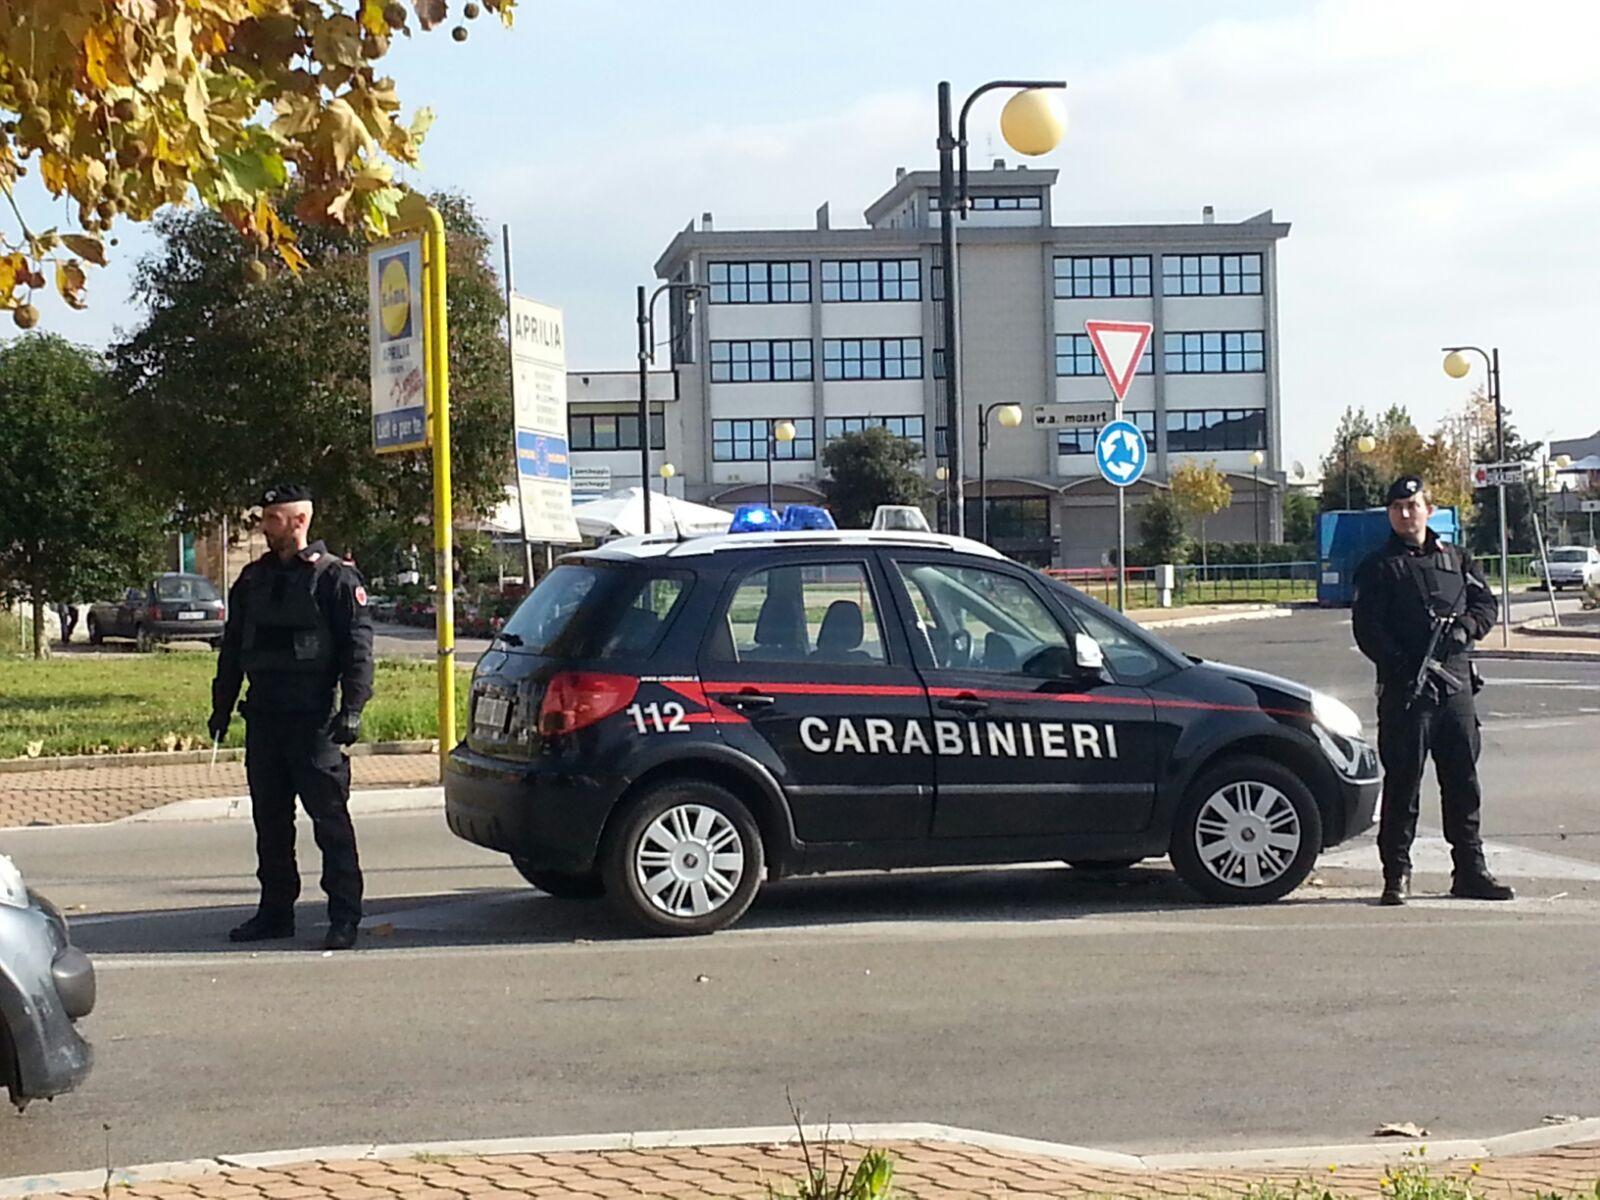 cc via Mascagni